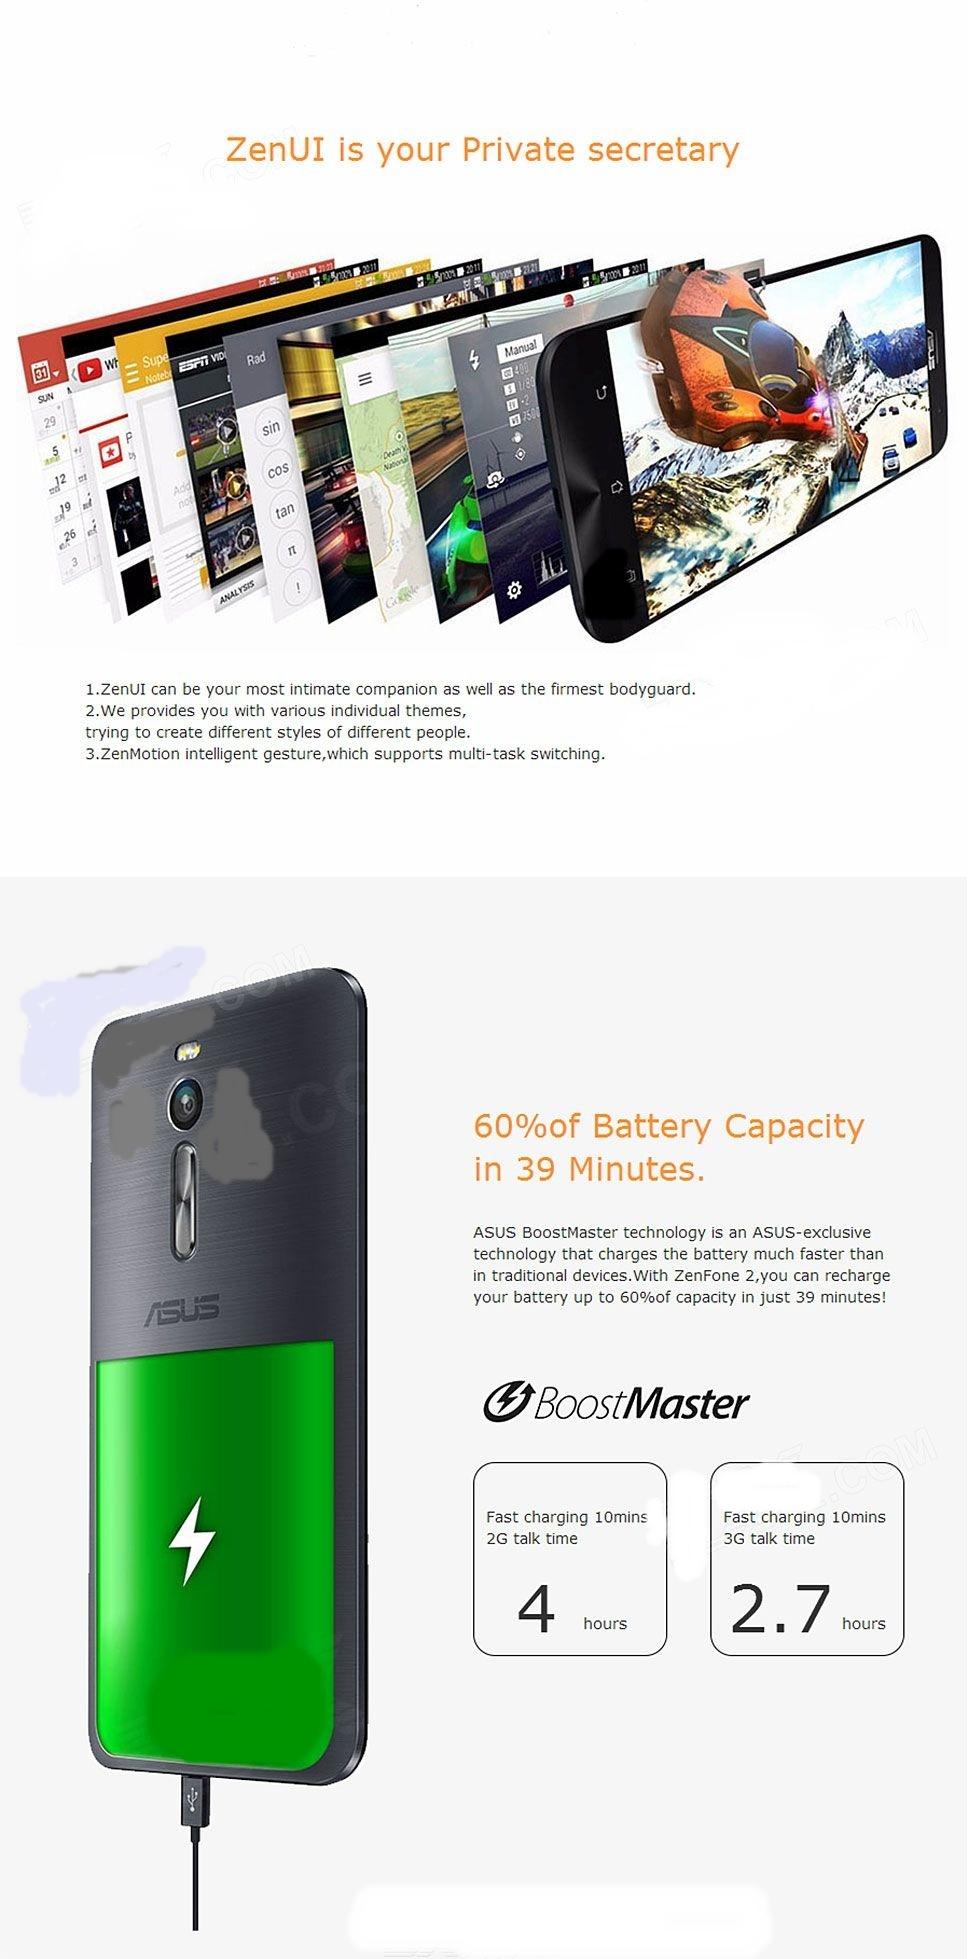 i.ibb.co/k5VSGbL/Smartphone-Android-5-0-4-GB-RAM-32-GB-ROM-Quad-Core-4-G-ASUS-Zenfone-2-ZE551-ML-3.jpg